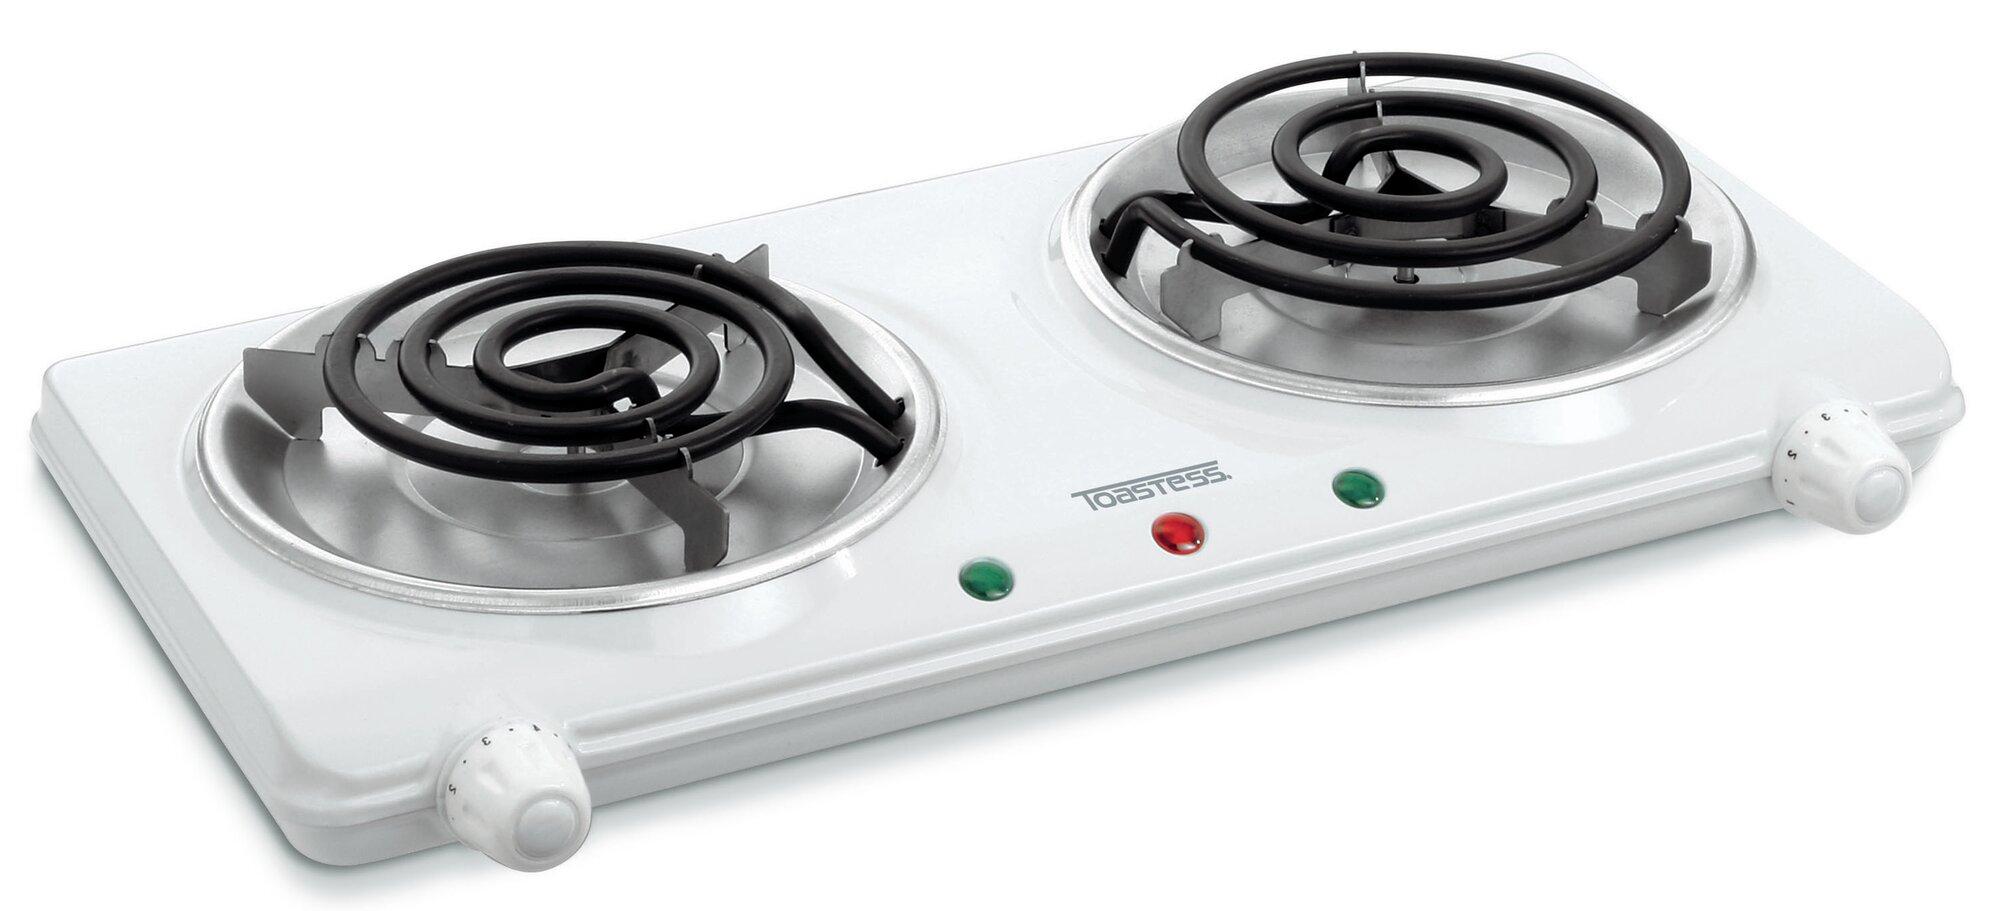 2 Burner Electric Cooktop ~ Salton portable quot electric cooktop with burners